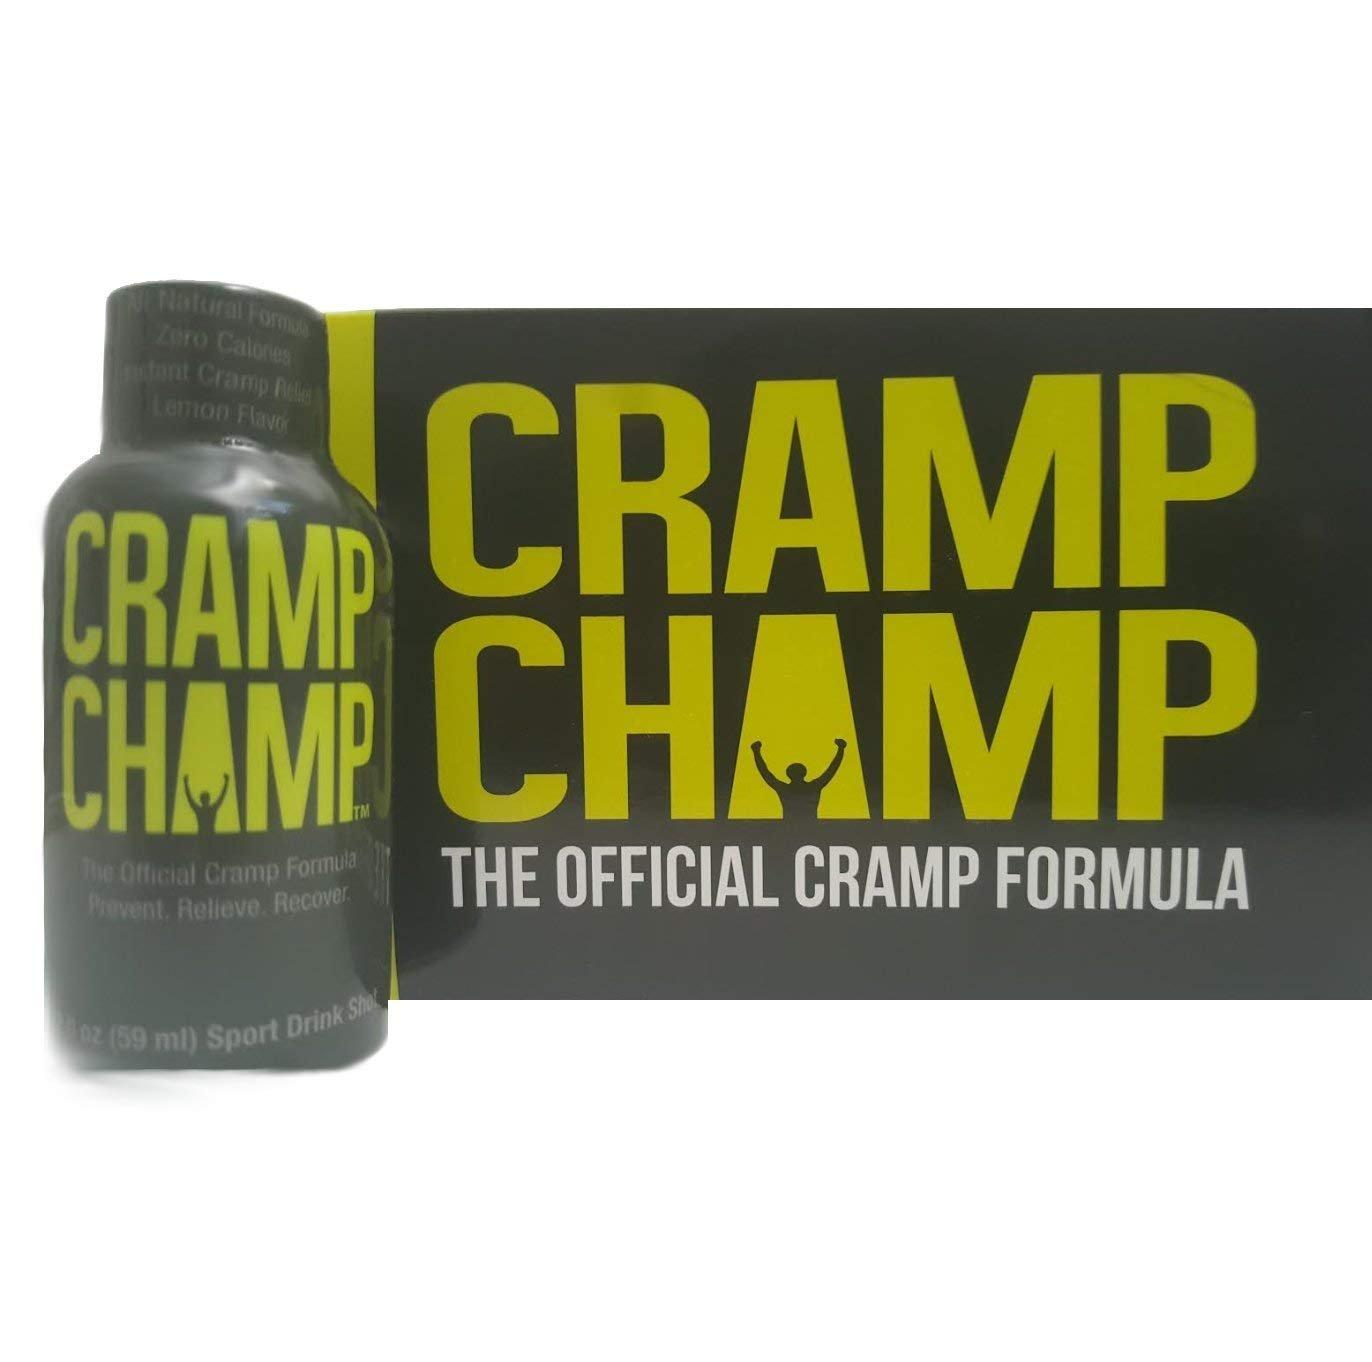 Cramp Champ - Muscle Cramp relief, natural sports drink shot. For calf, leg, foot etc. (12 Pack) 2oz bottles